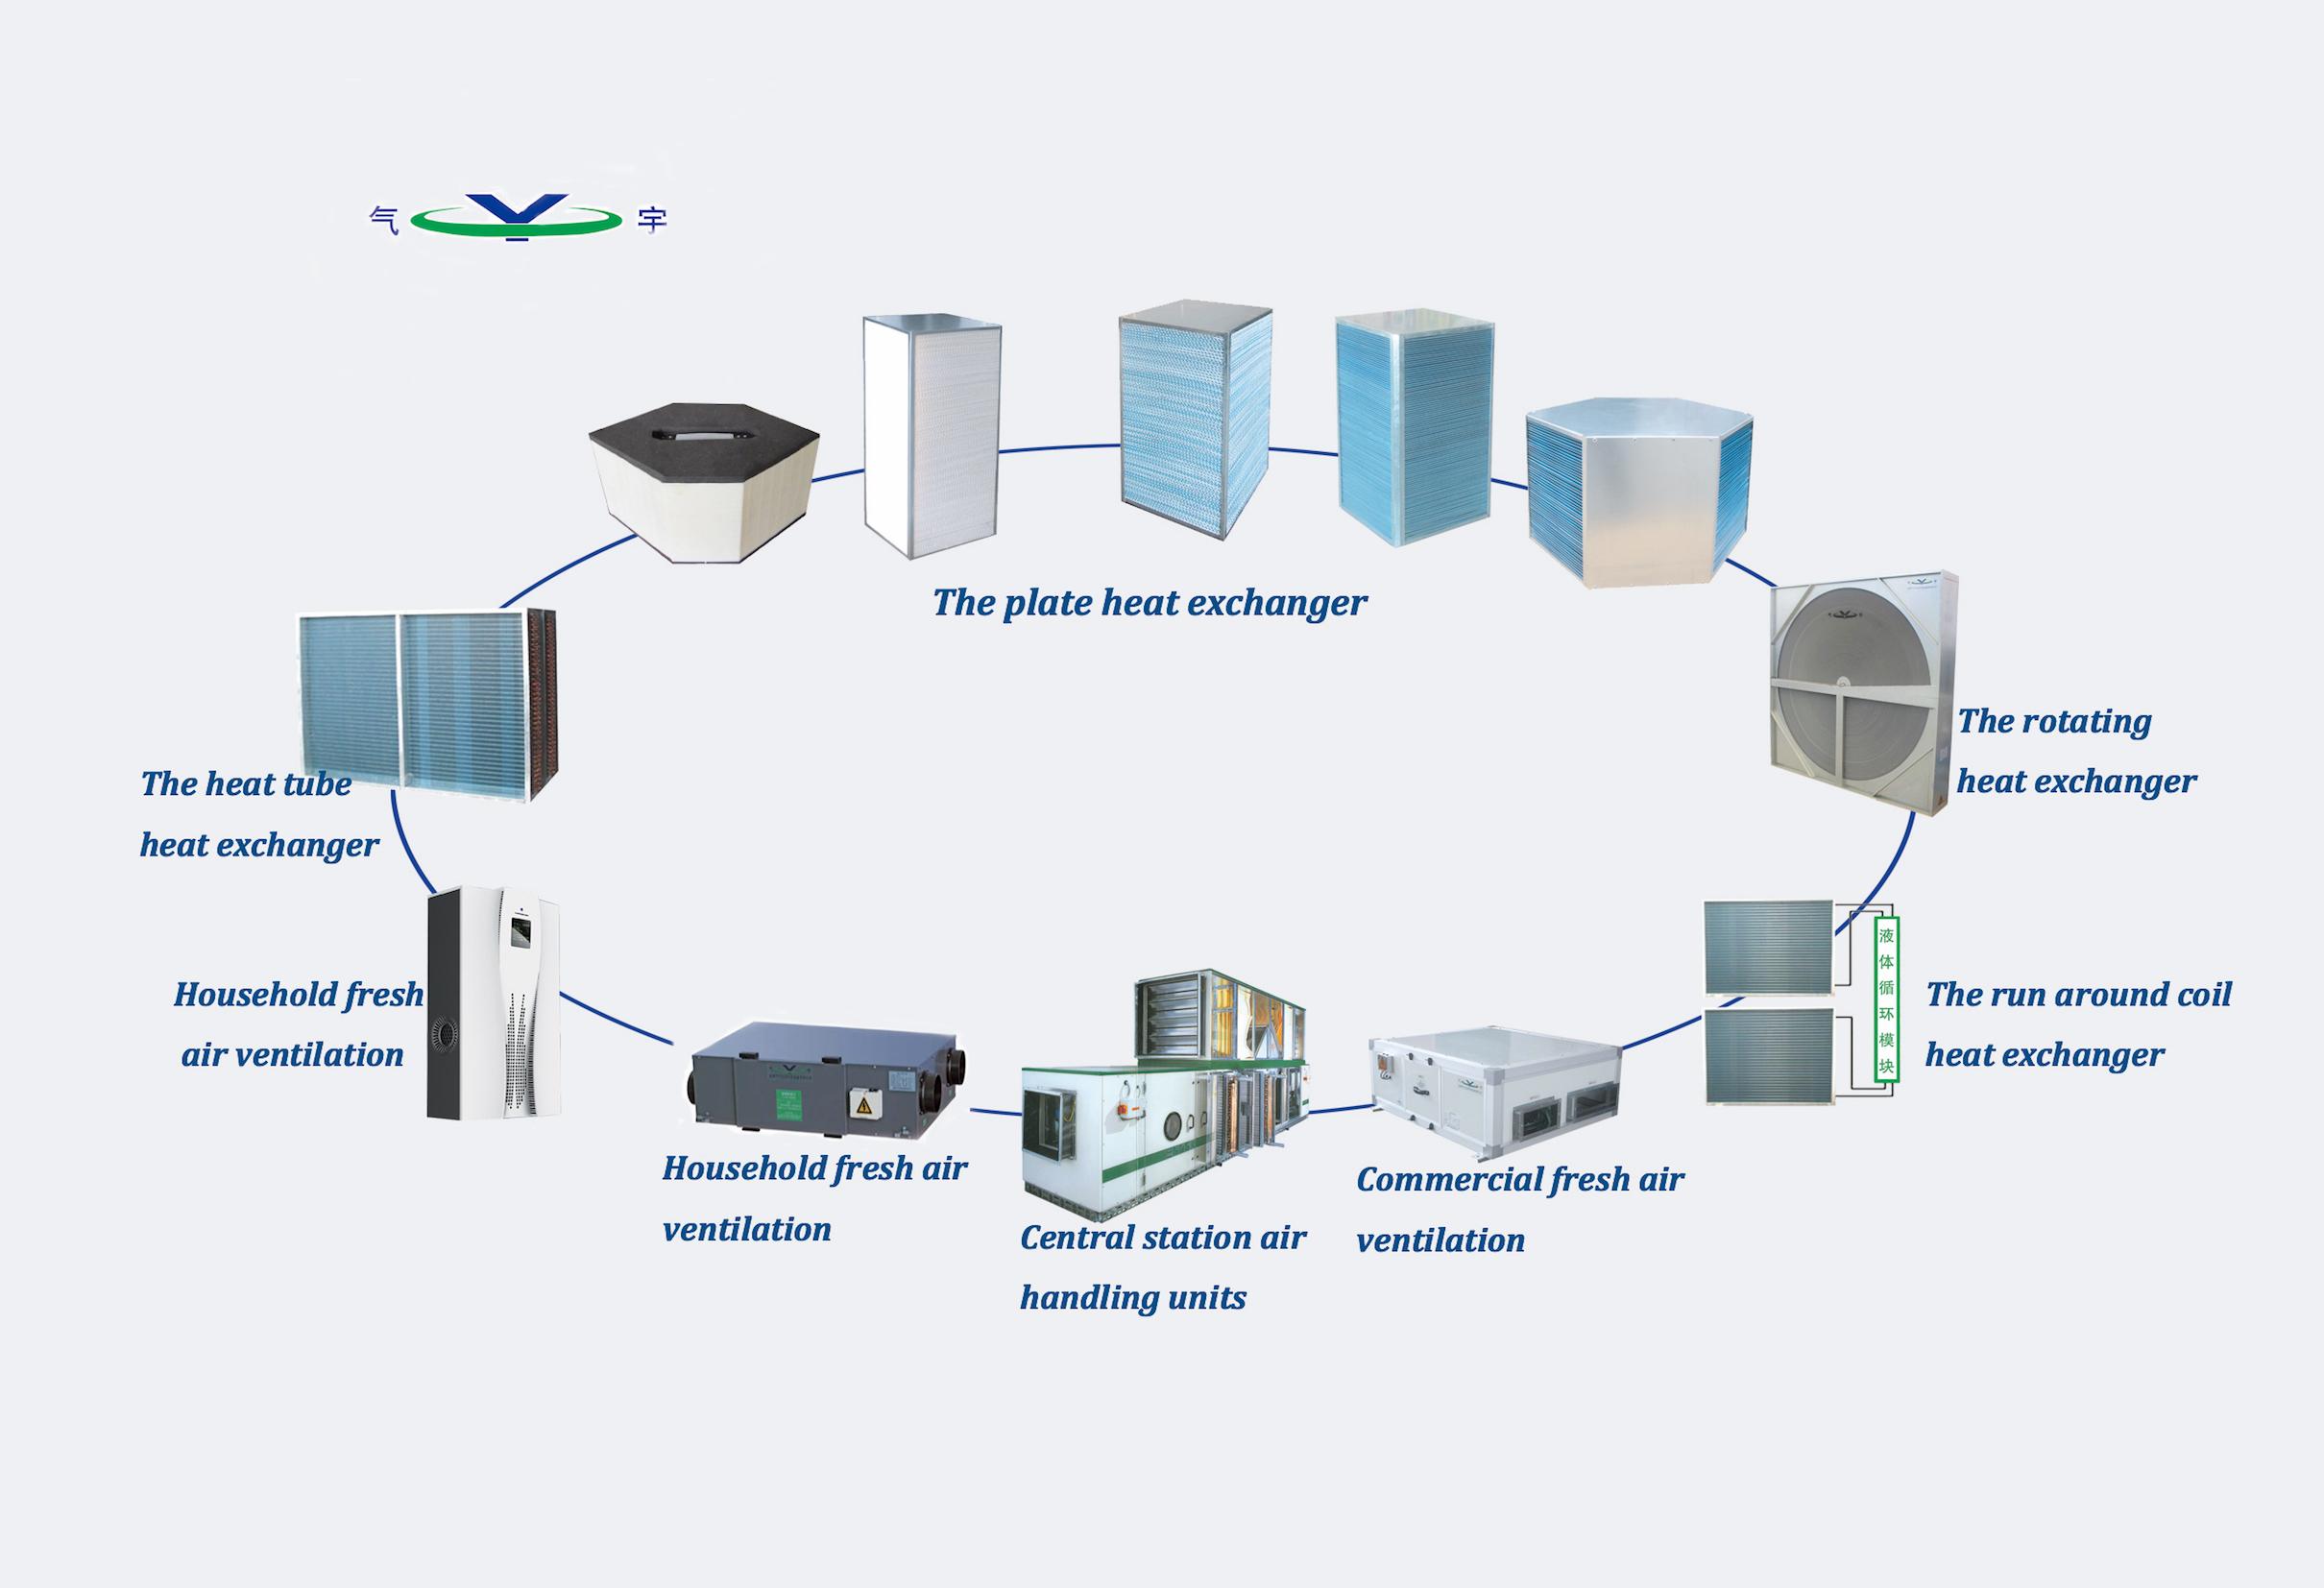 Luchtbehandelingskast lucht-lucht warmte pijp warmtewisselaar